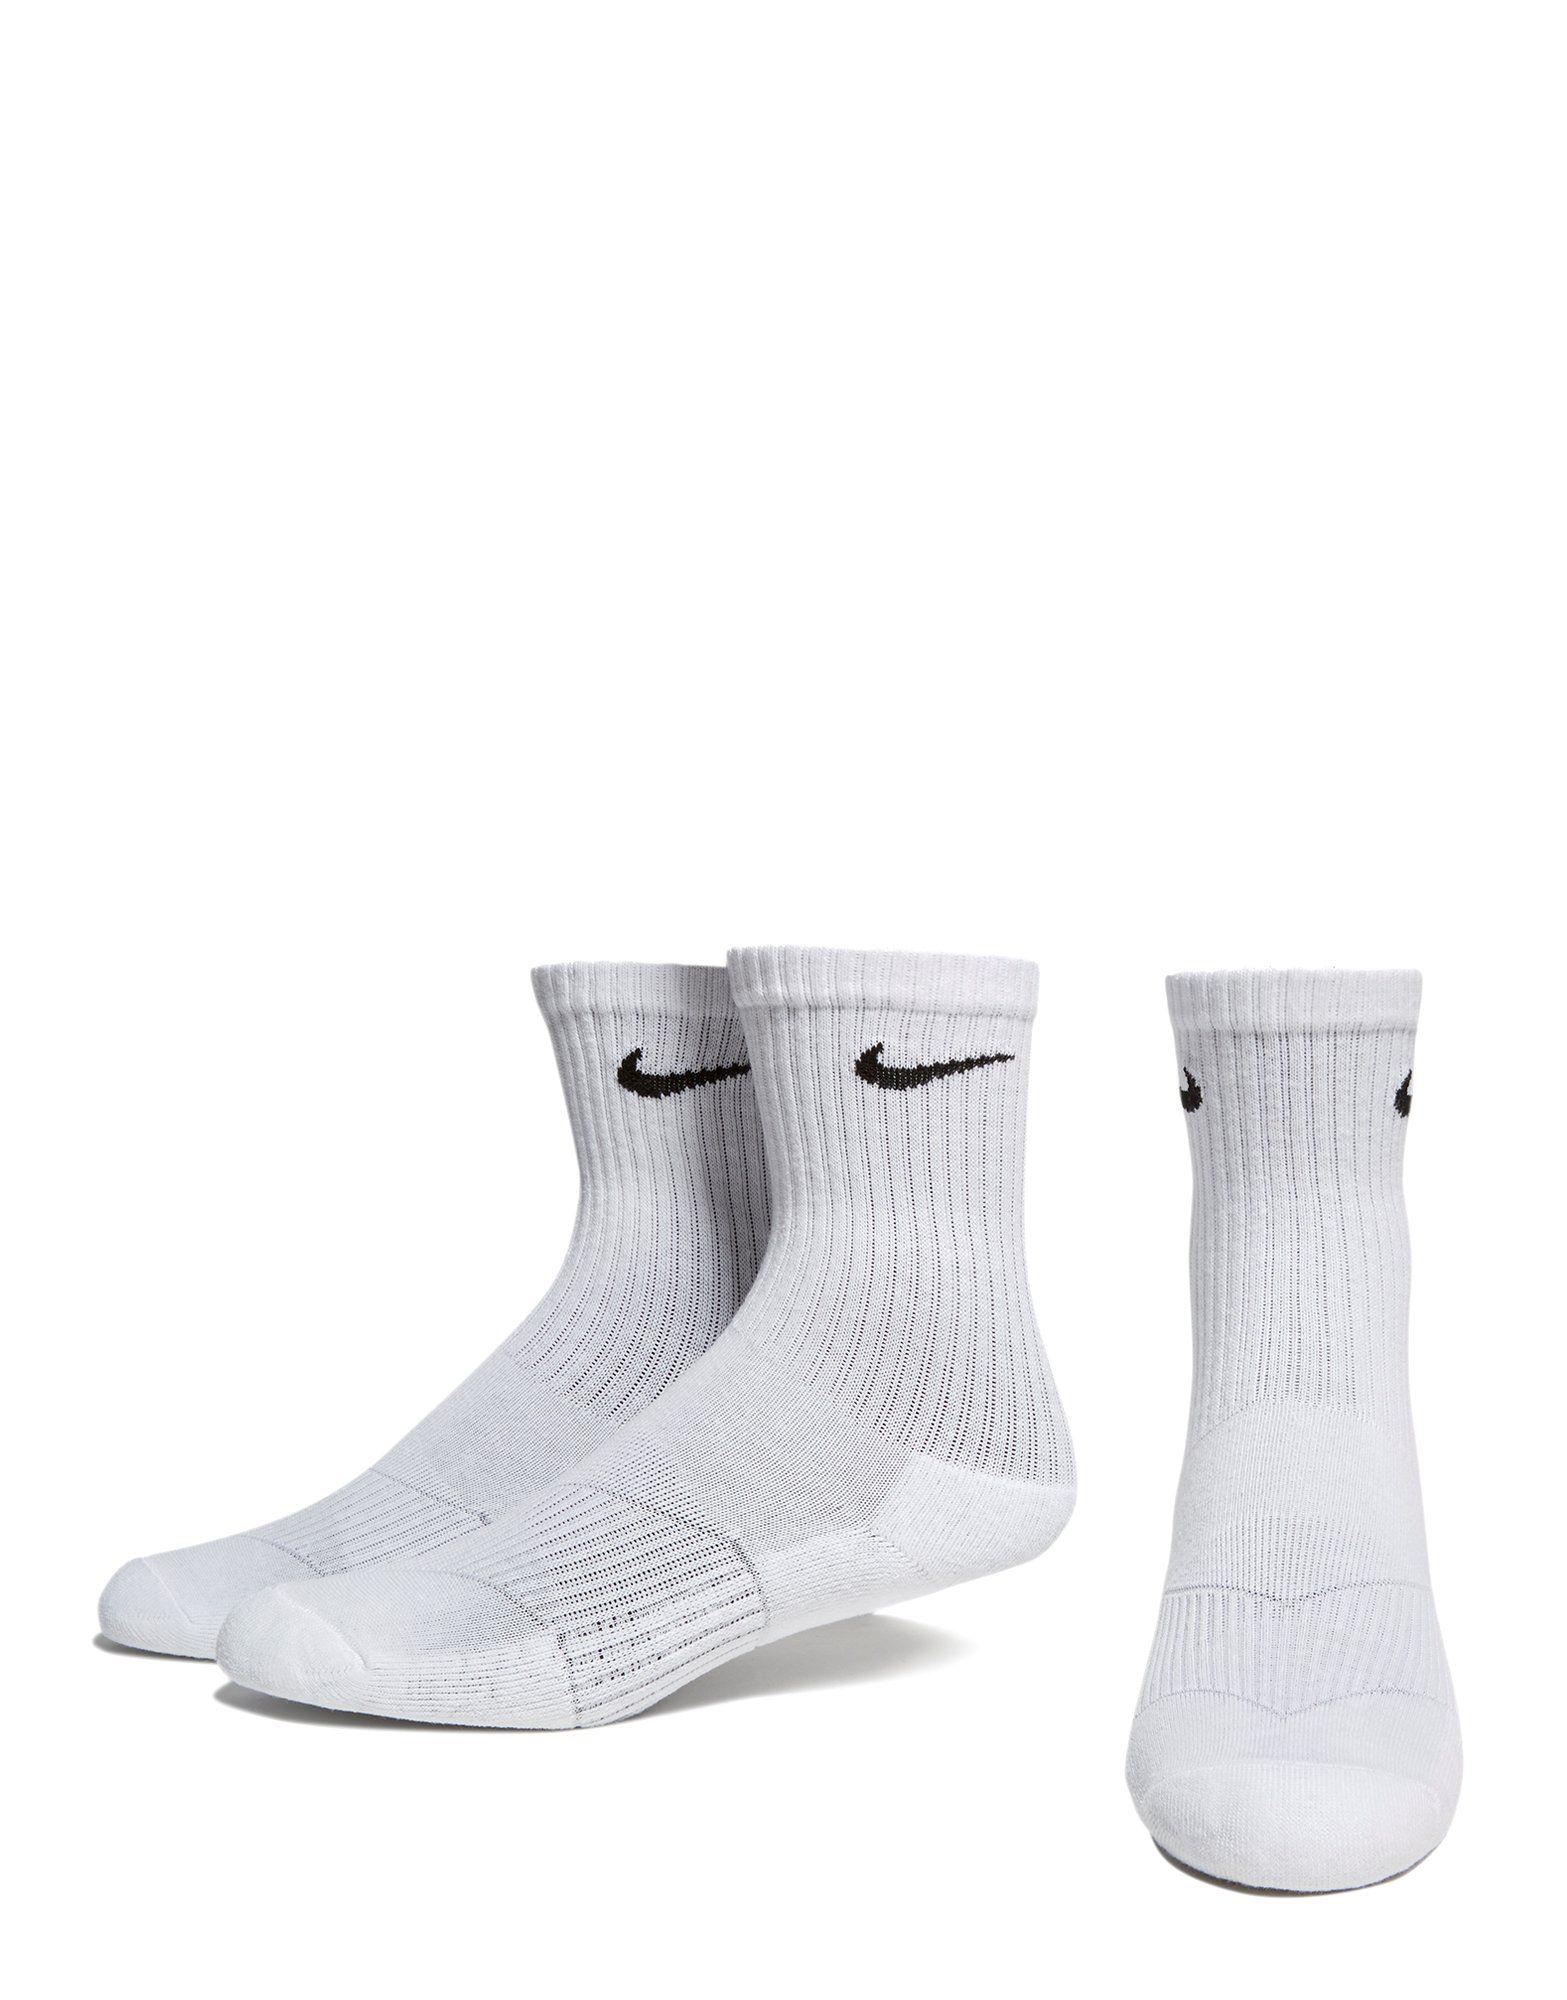 Nike pack de 3 calcetines júnior